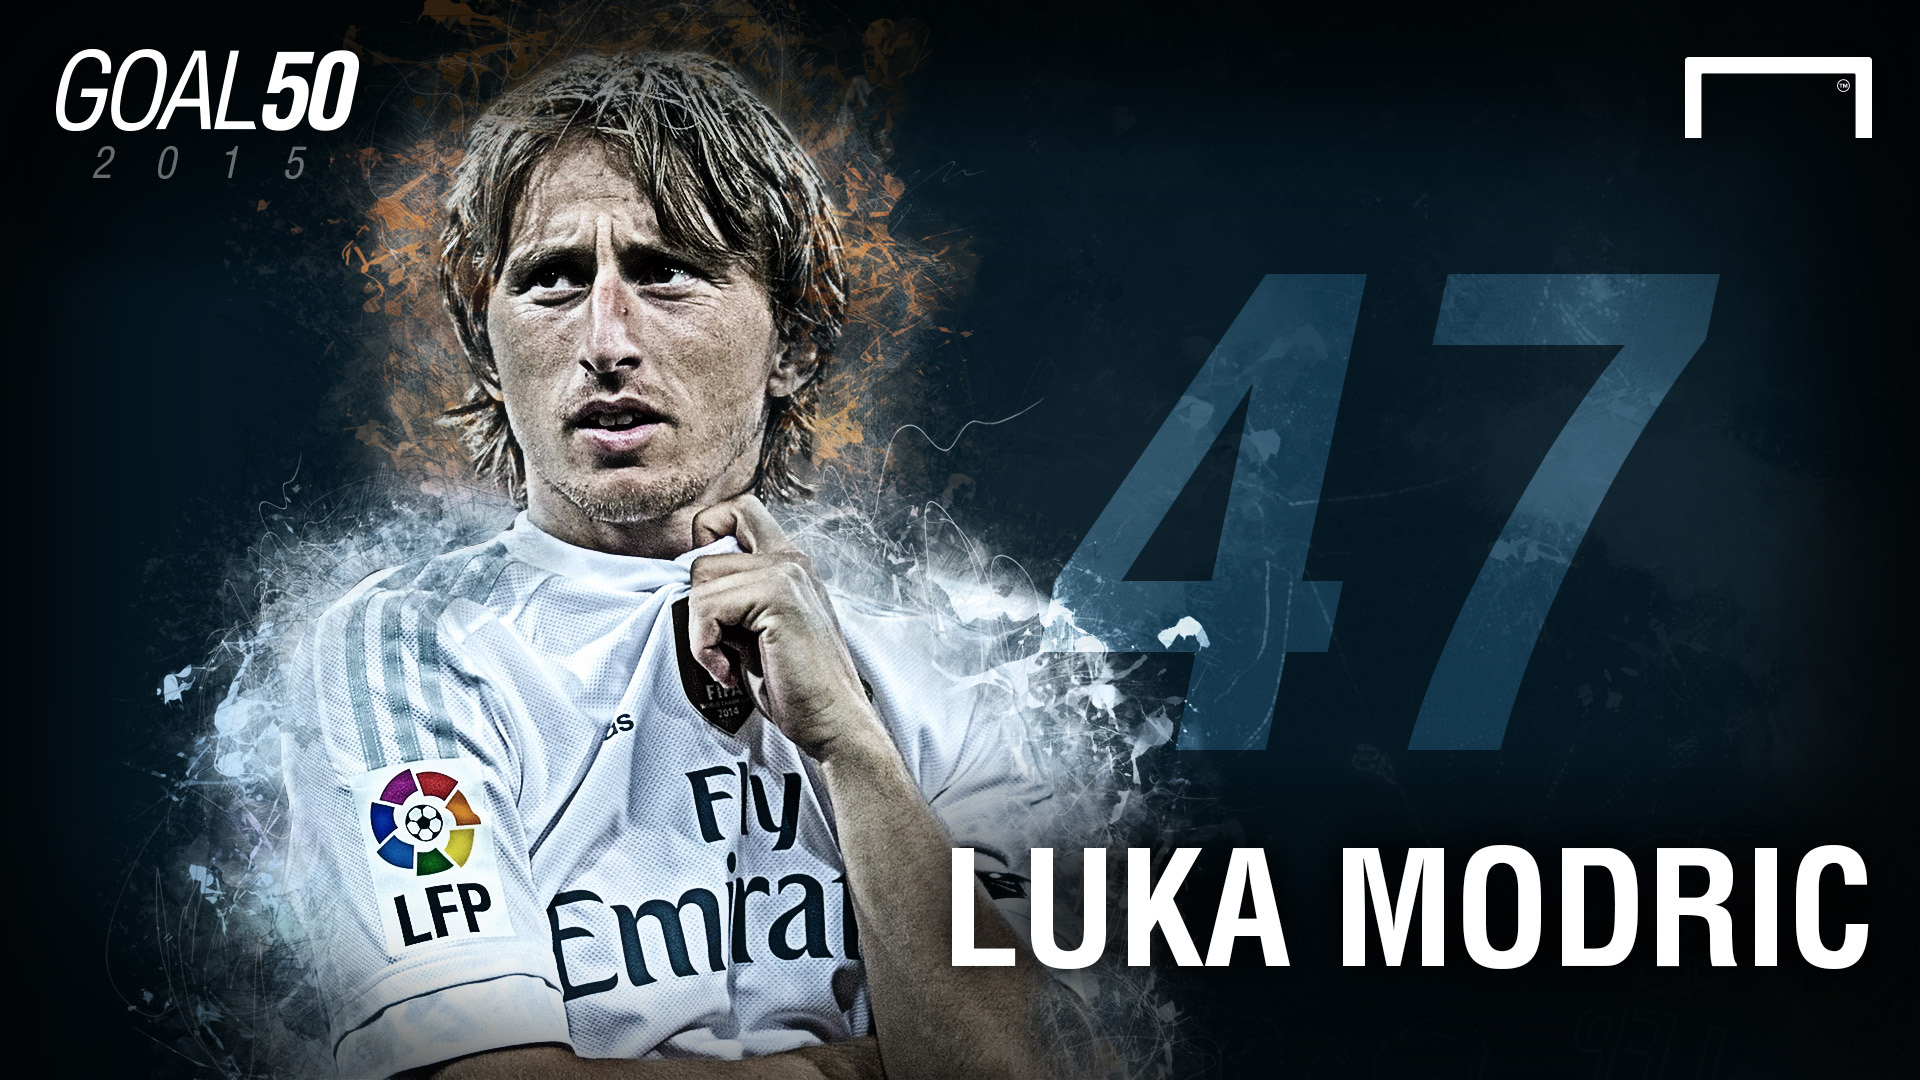 Luka Modric Wallpaper